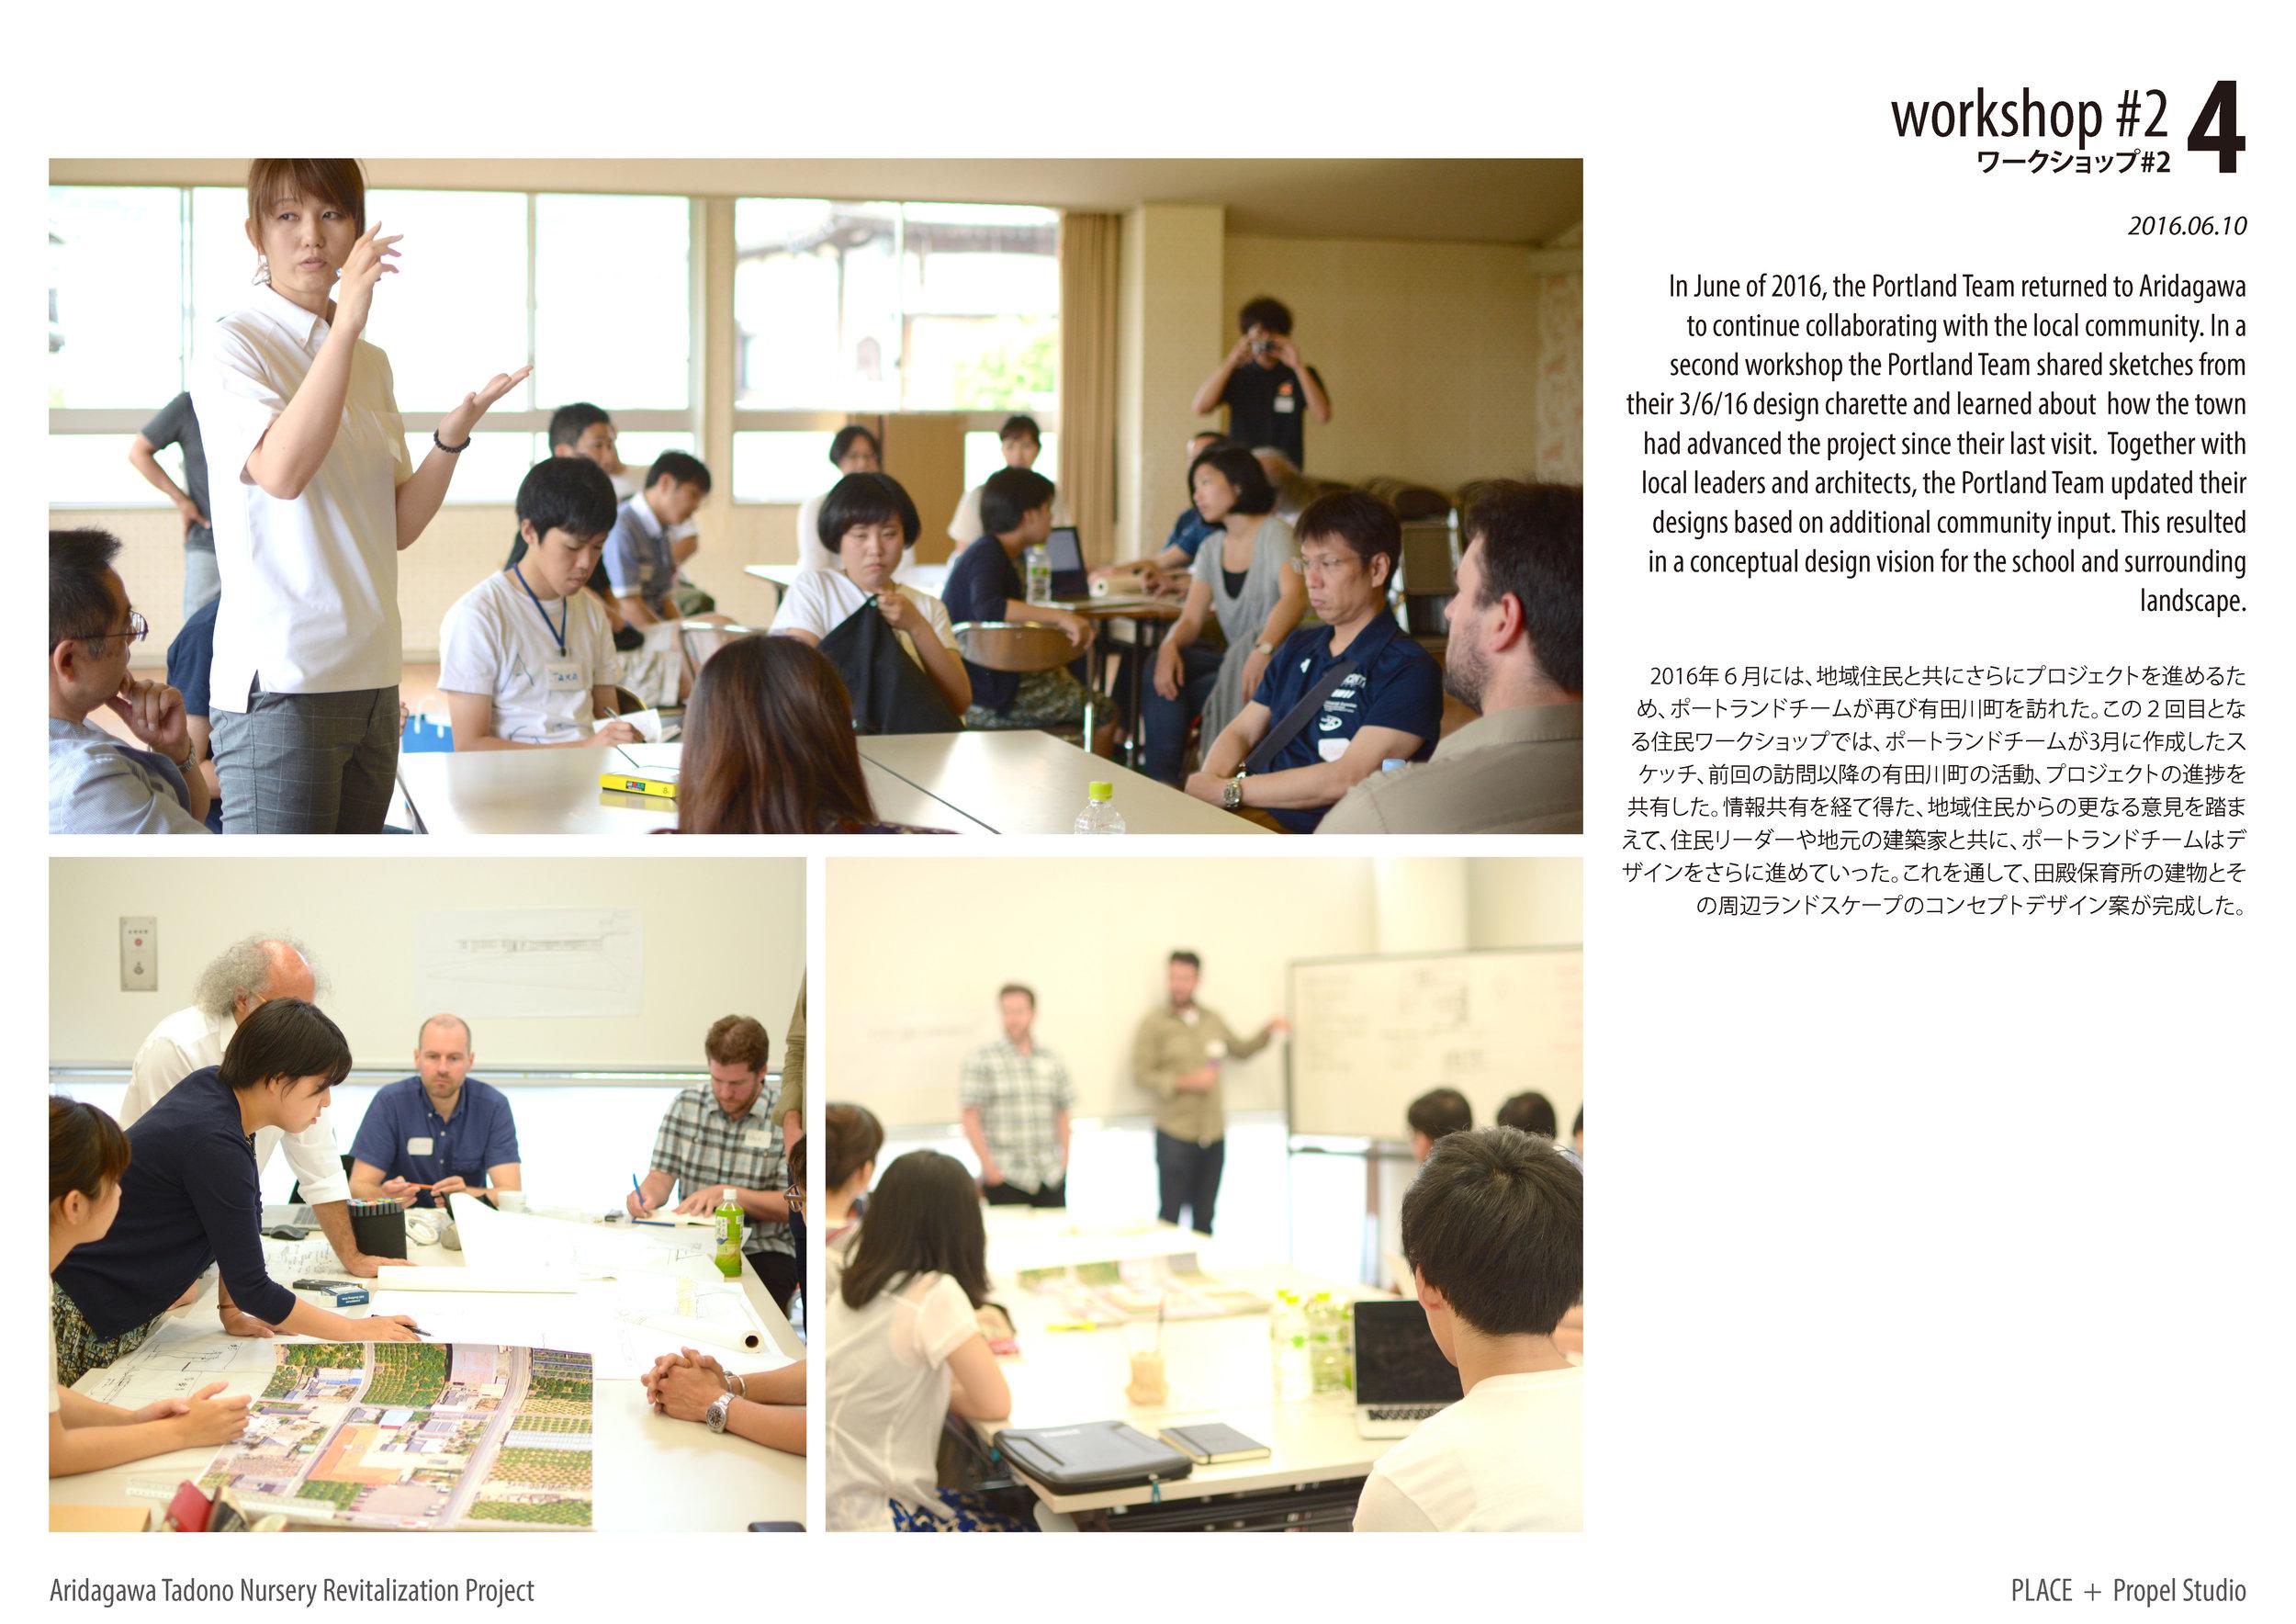 2016.06.30_Aridagawa Summary_Page_09.jpg